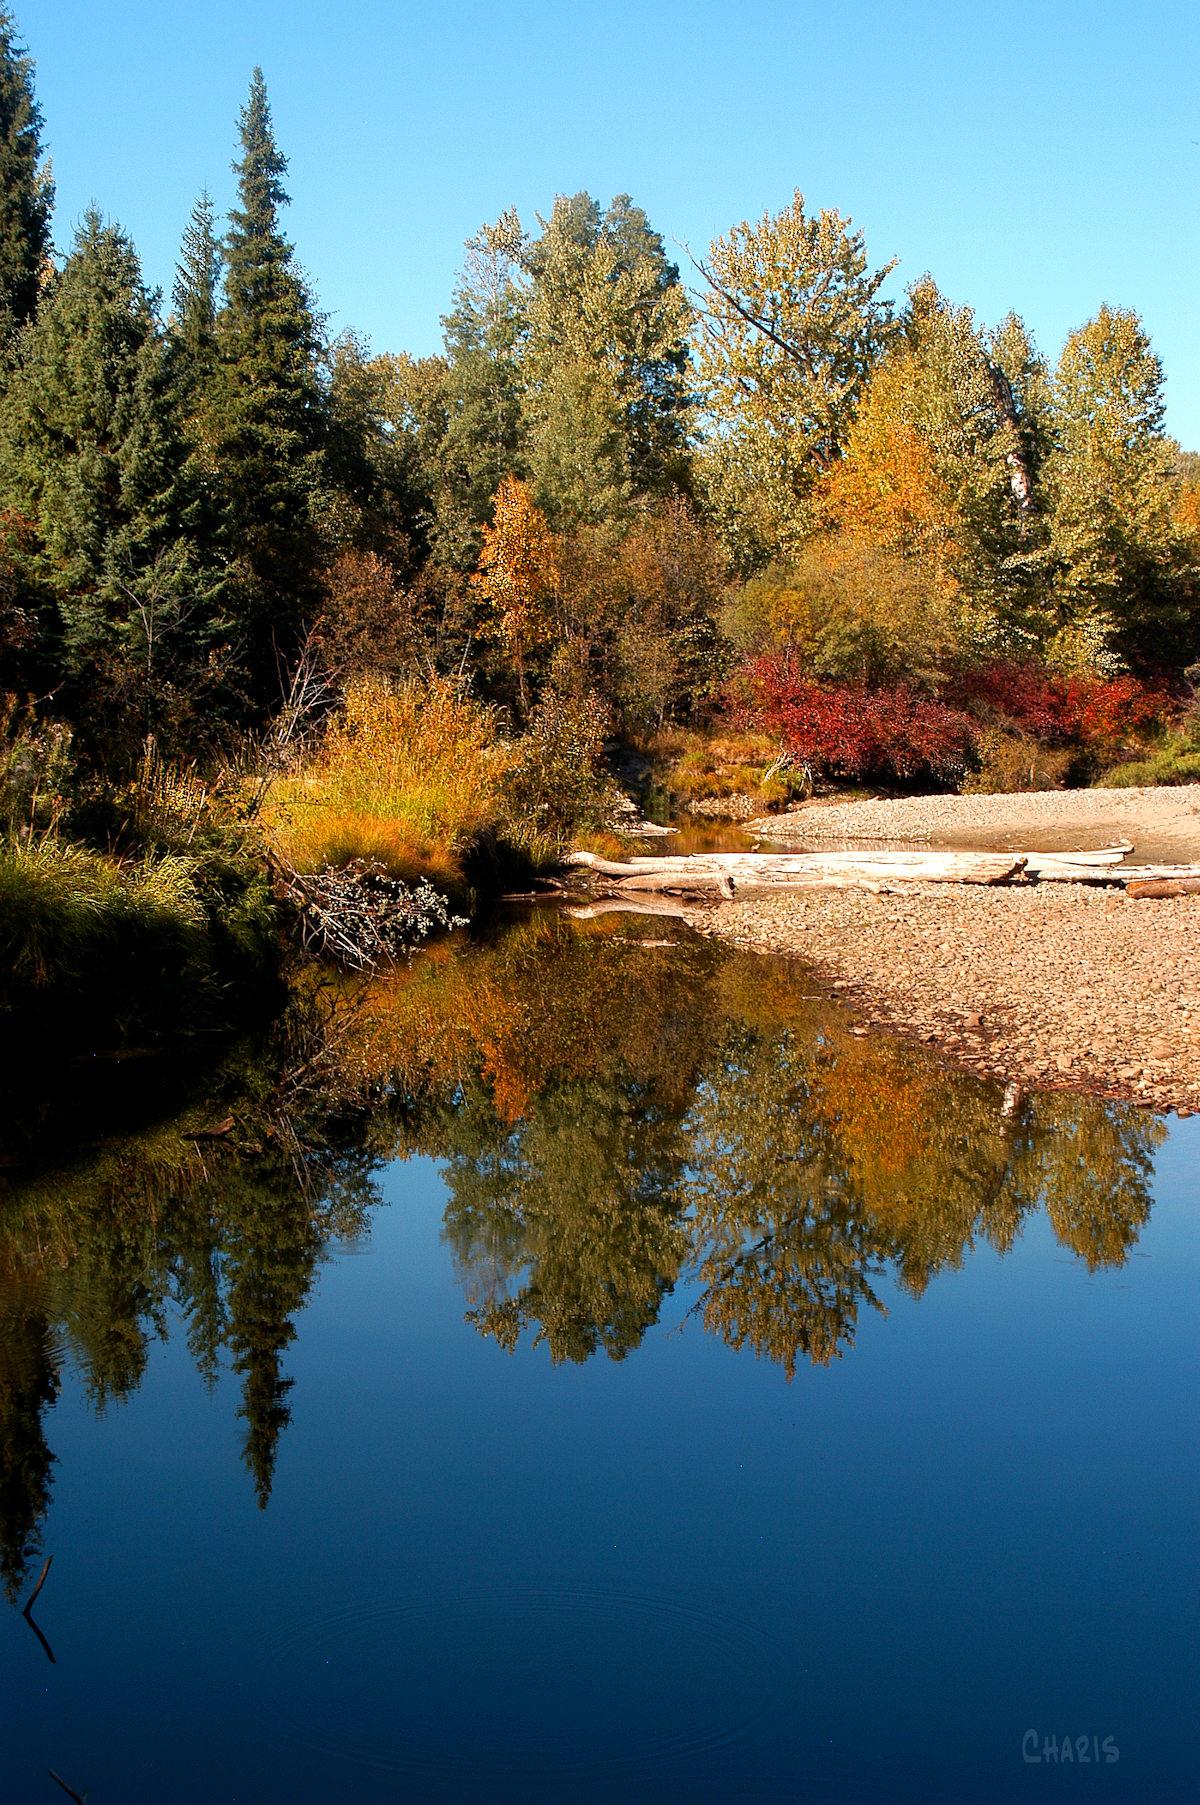 moyie river autumn ch rs DSC_0143 (2)